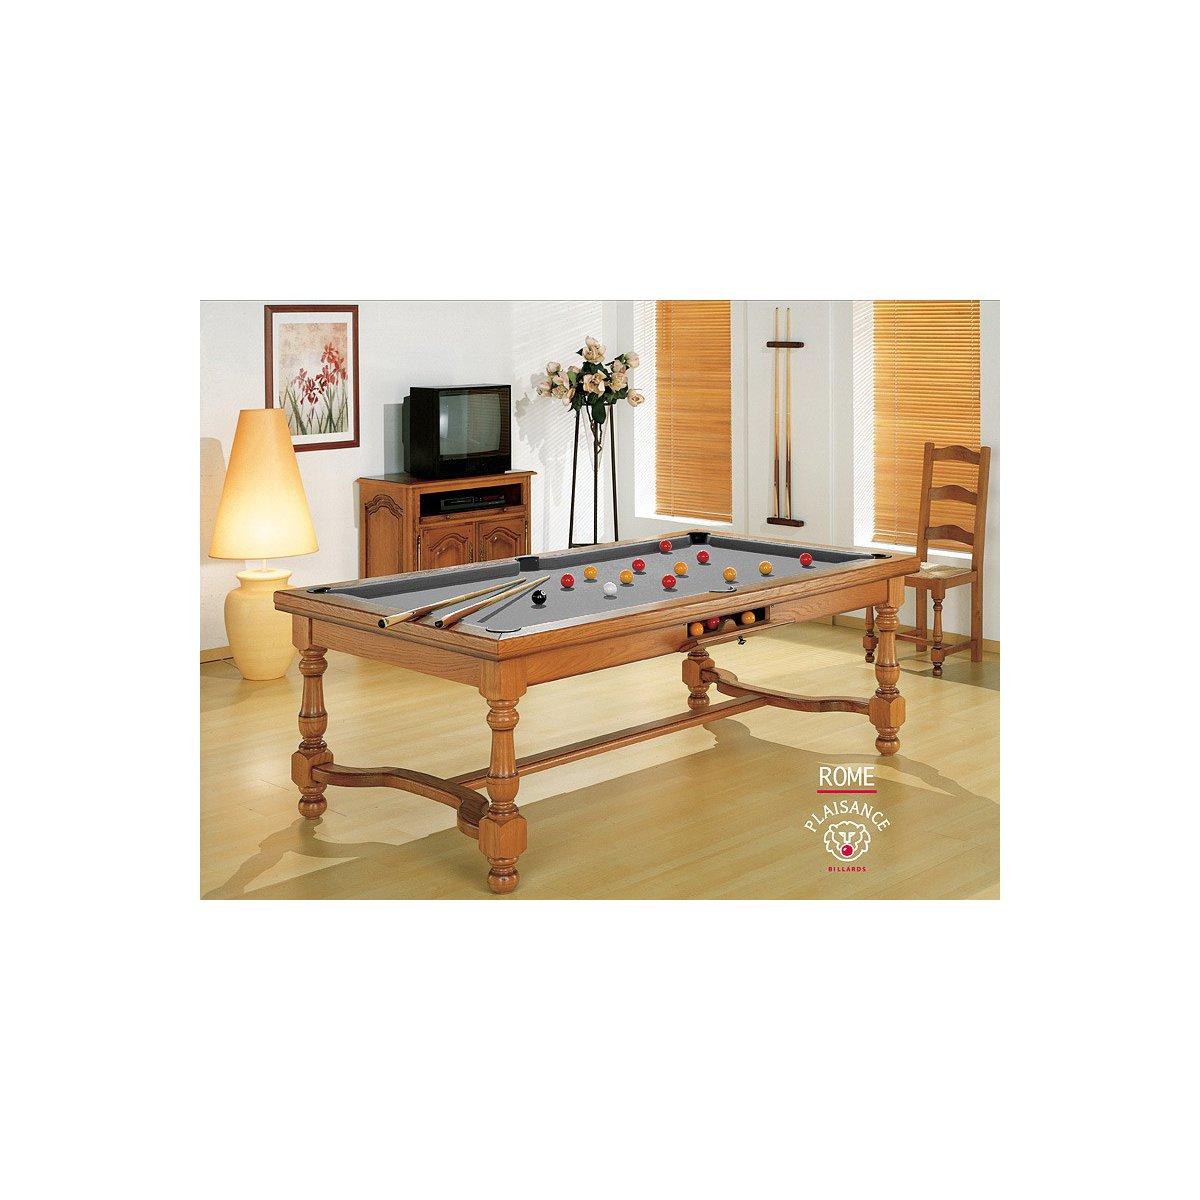 d coration table billard convertible 17 besancon. Black Bedroom Furniture Sets. Home Design Ideas